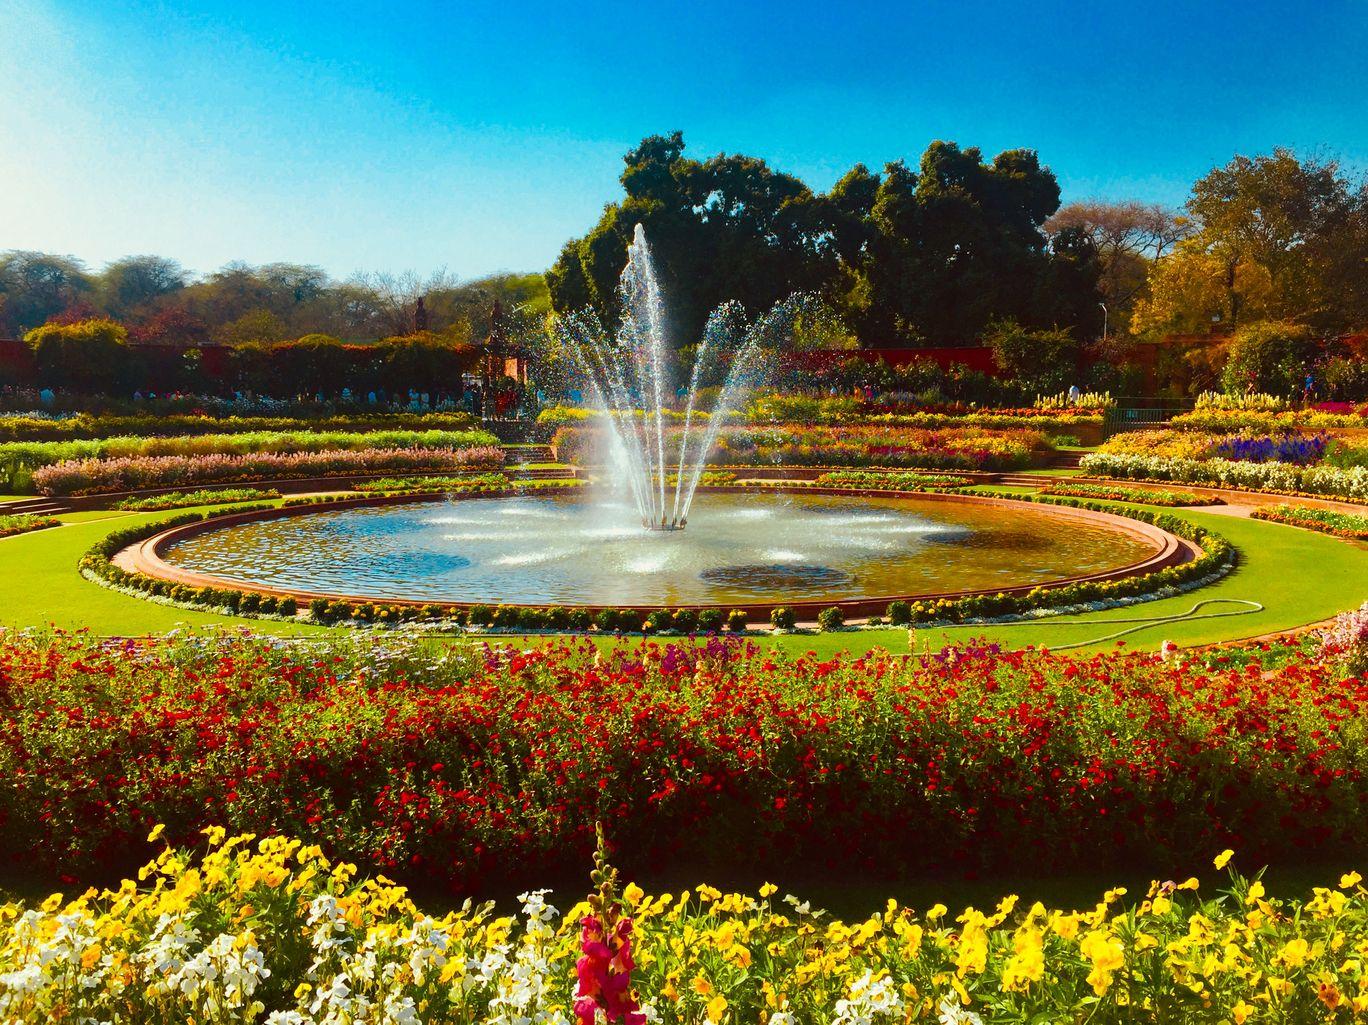 Photo of Mughal Gardens By deepali sukhija